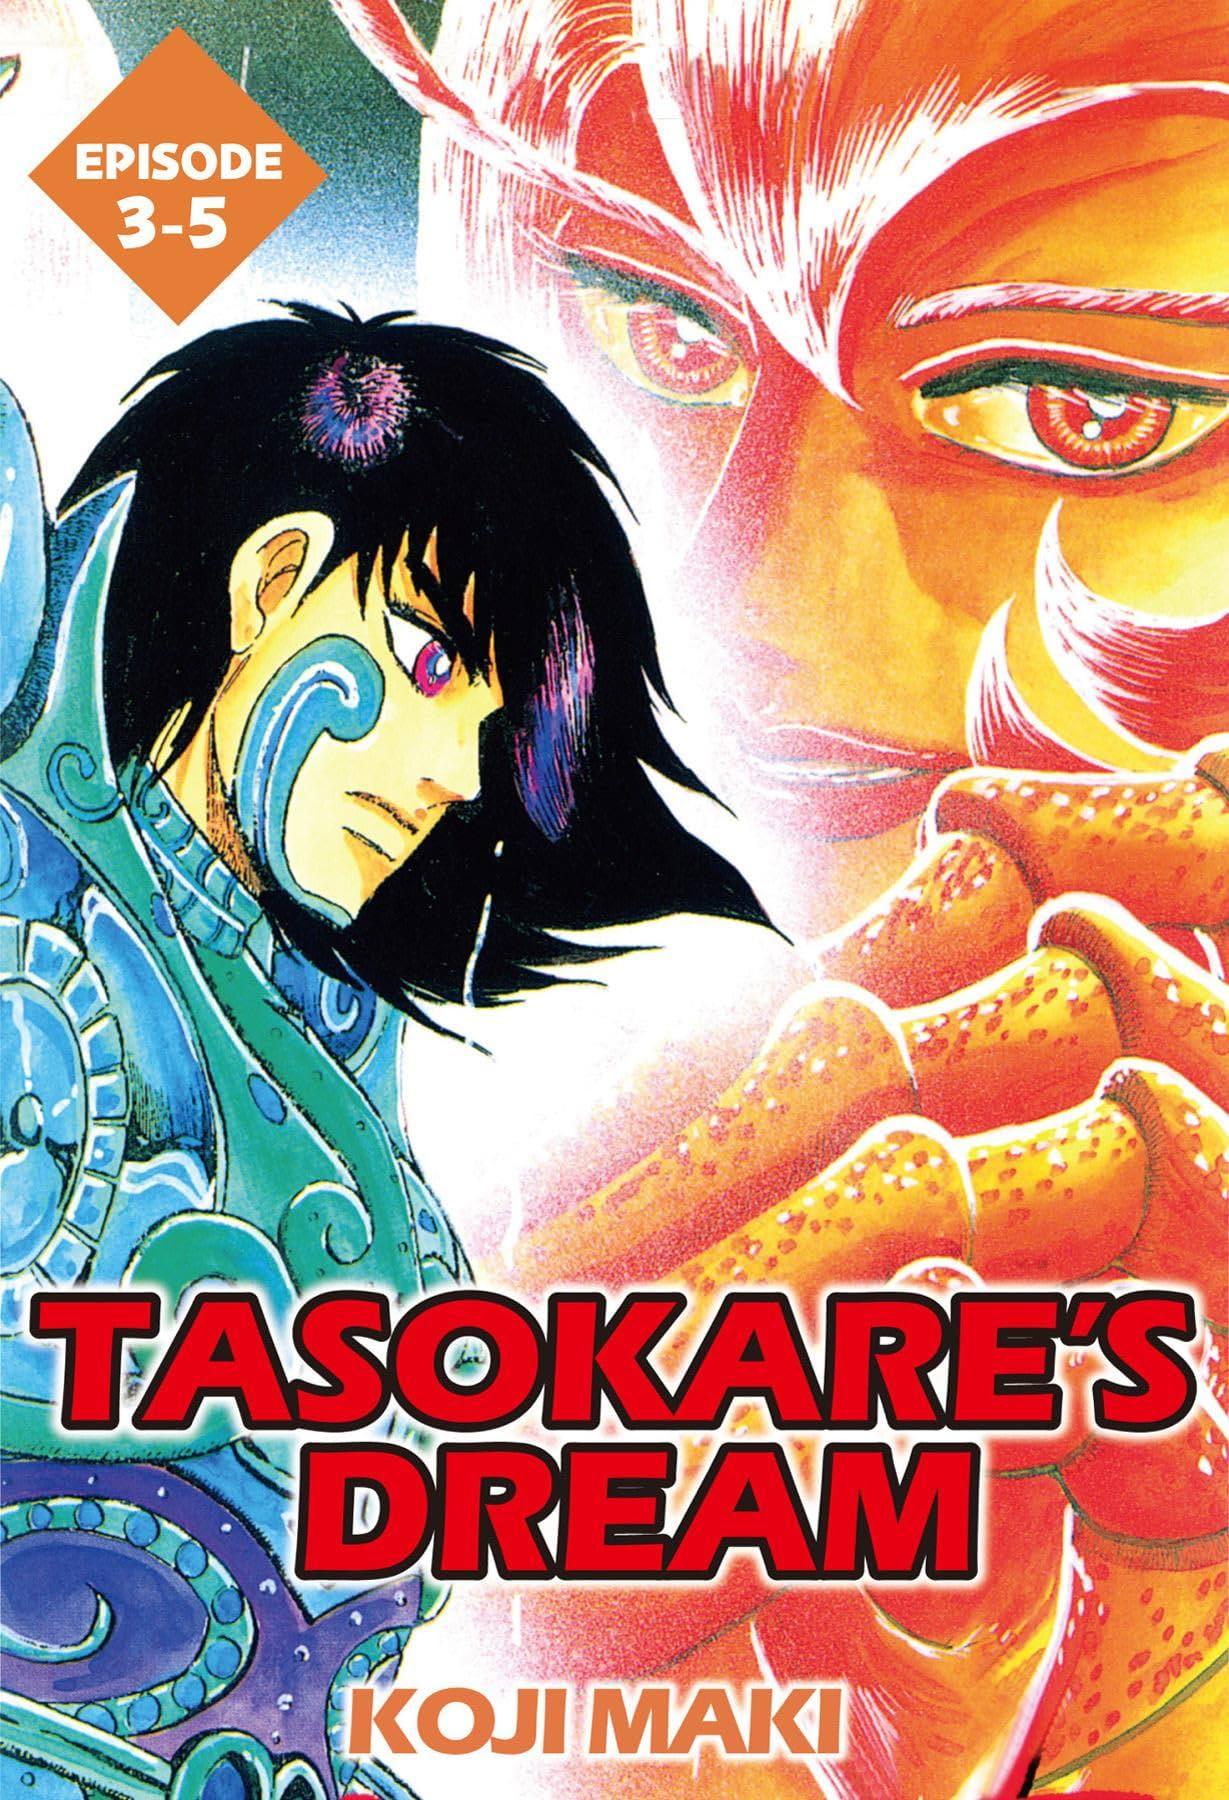 TASOKARE'S DREAM #19